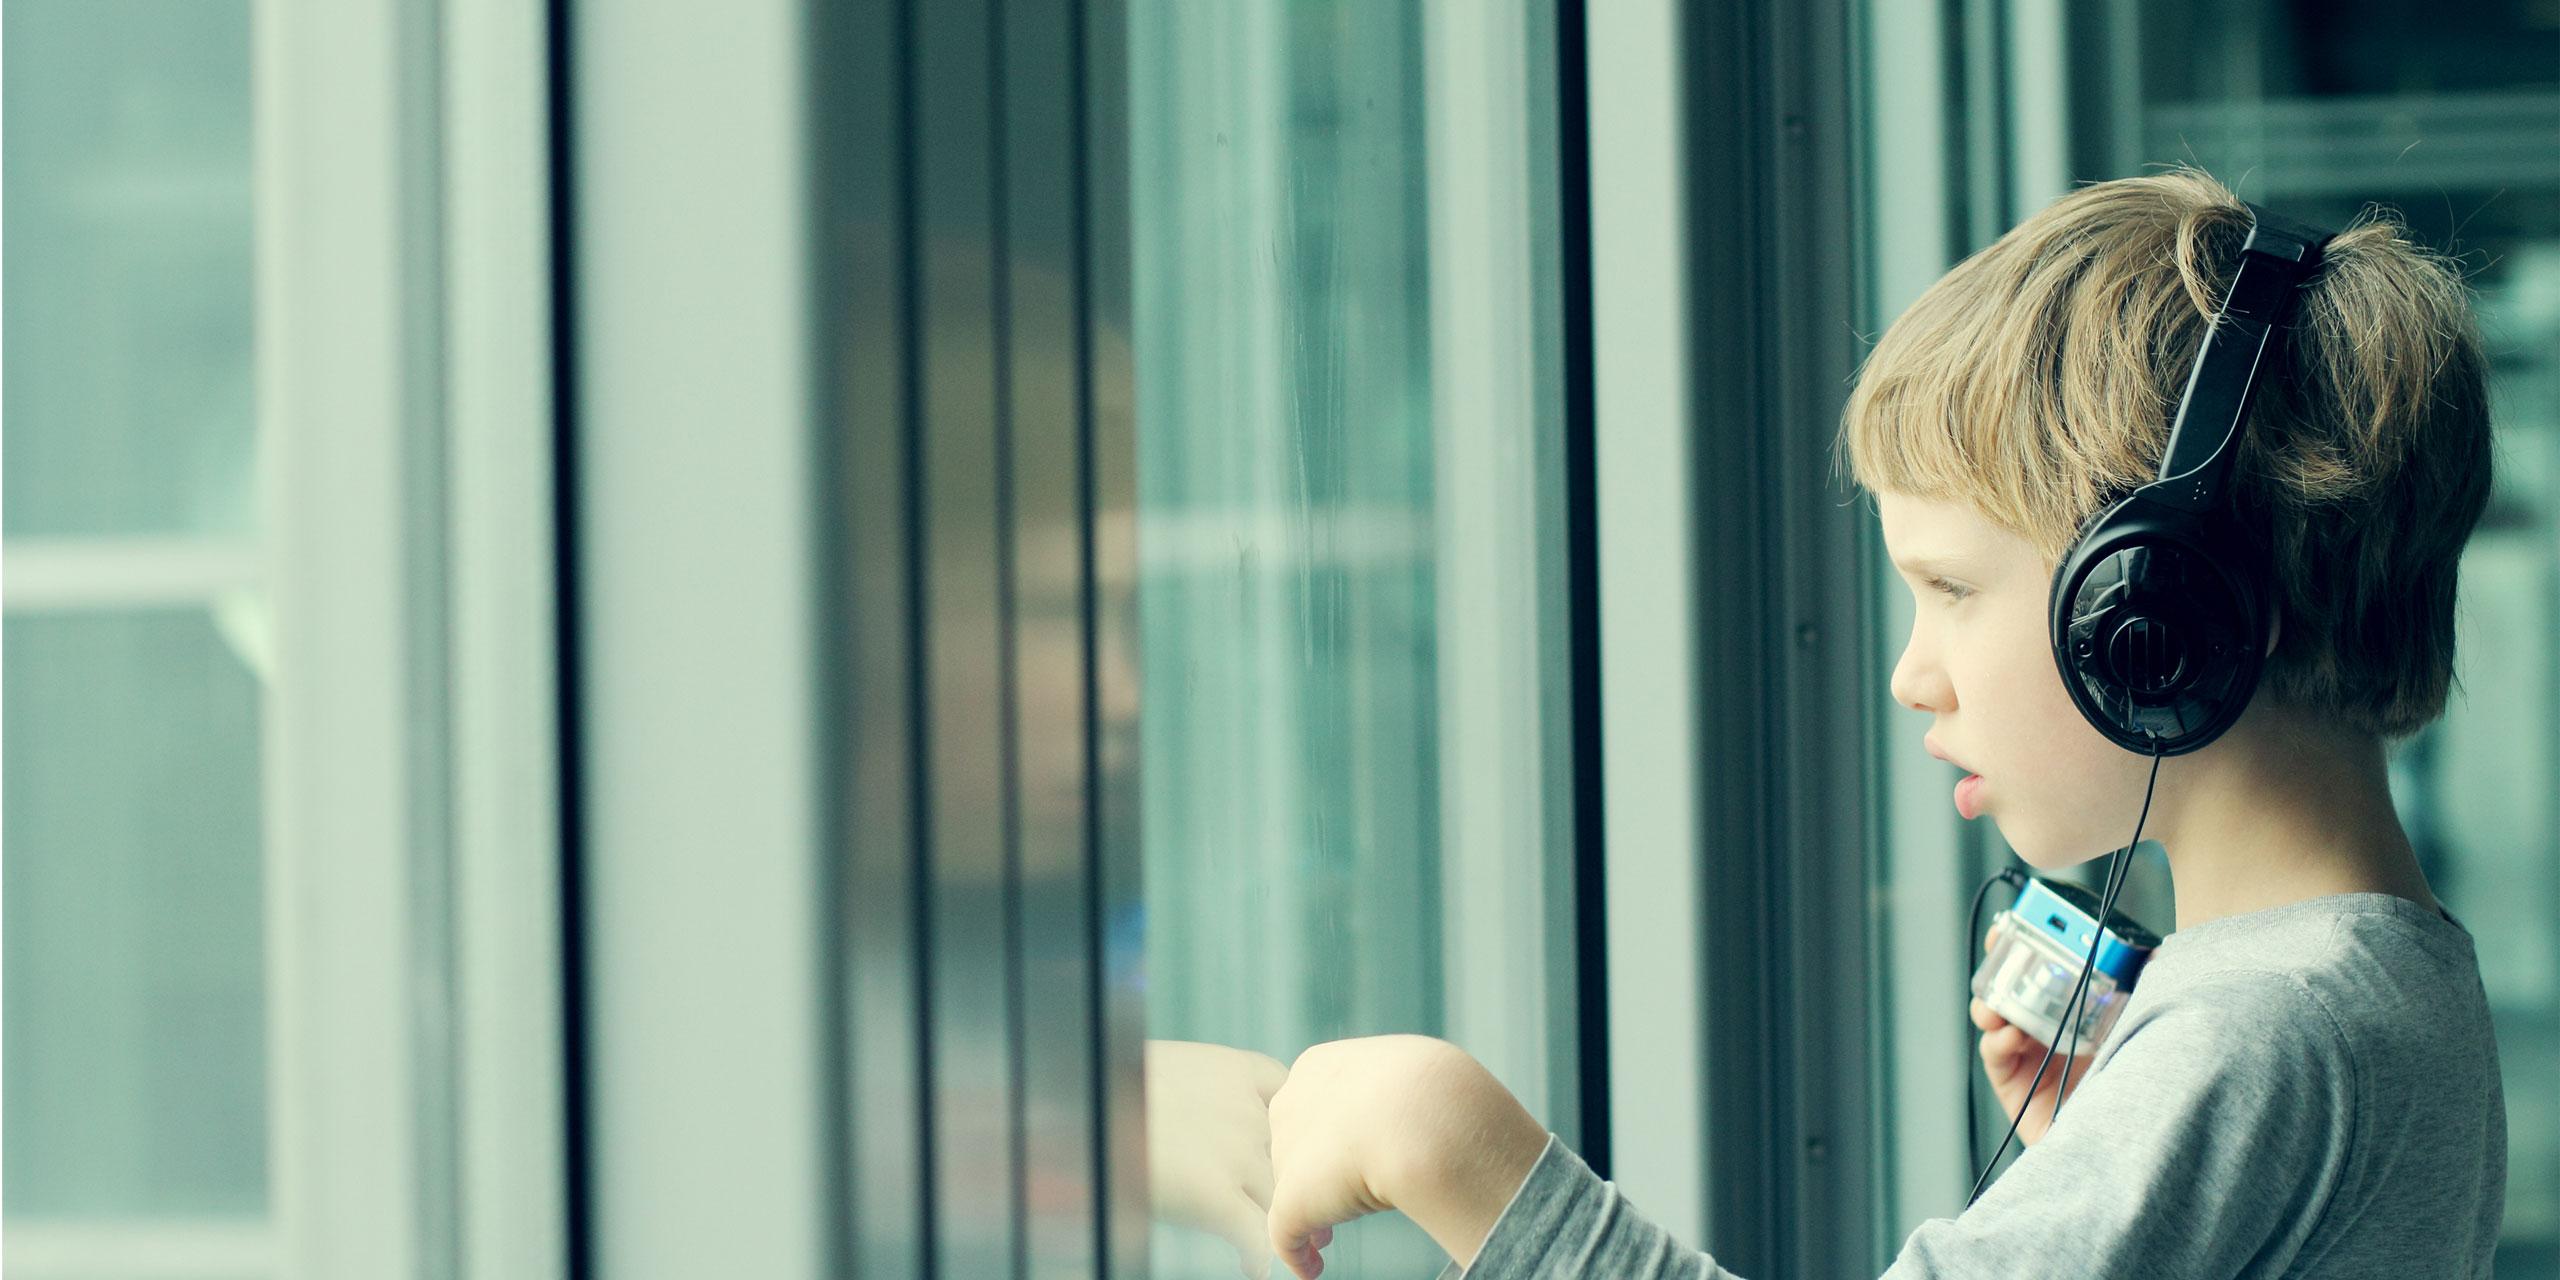 Boy Wearing Headphones; Courtesy of Dubova/Shutterstock.com